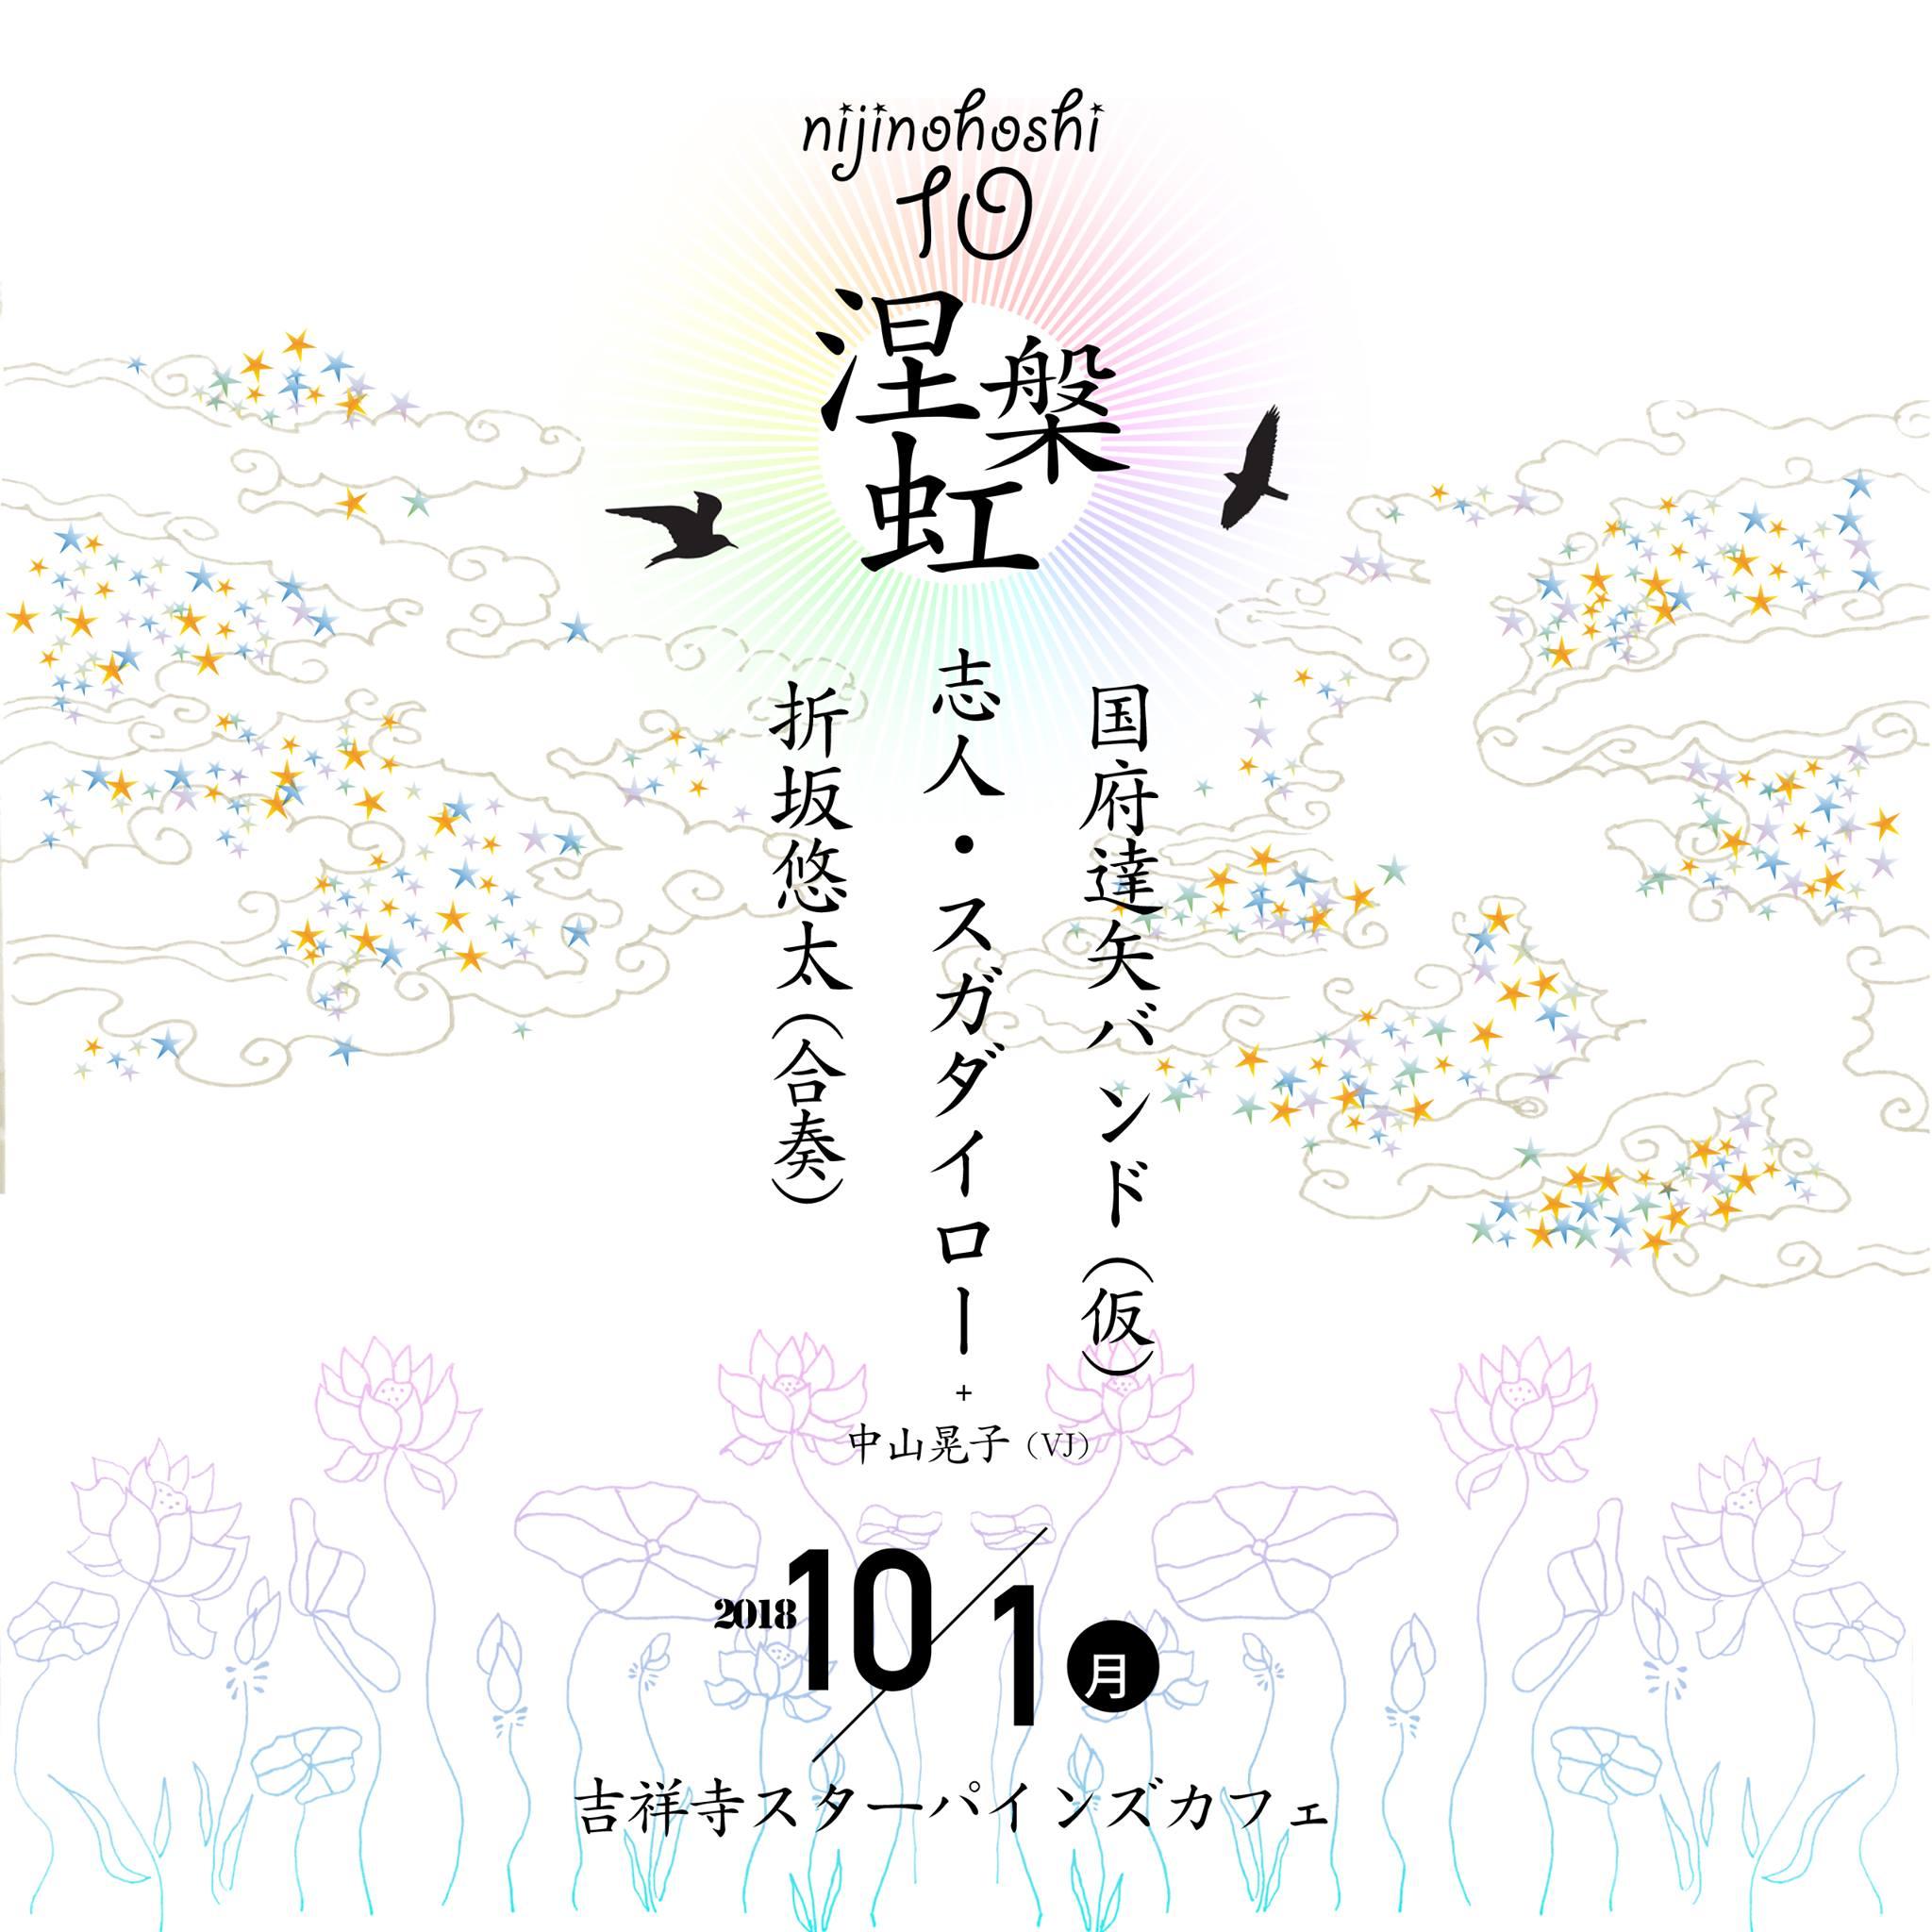 [nijinohoshi 10 涅槃虹]